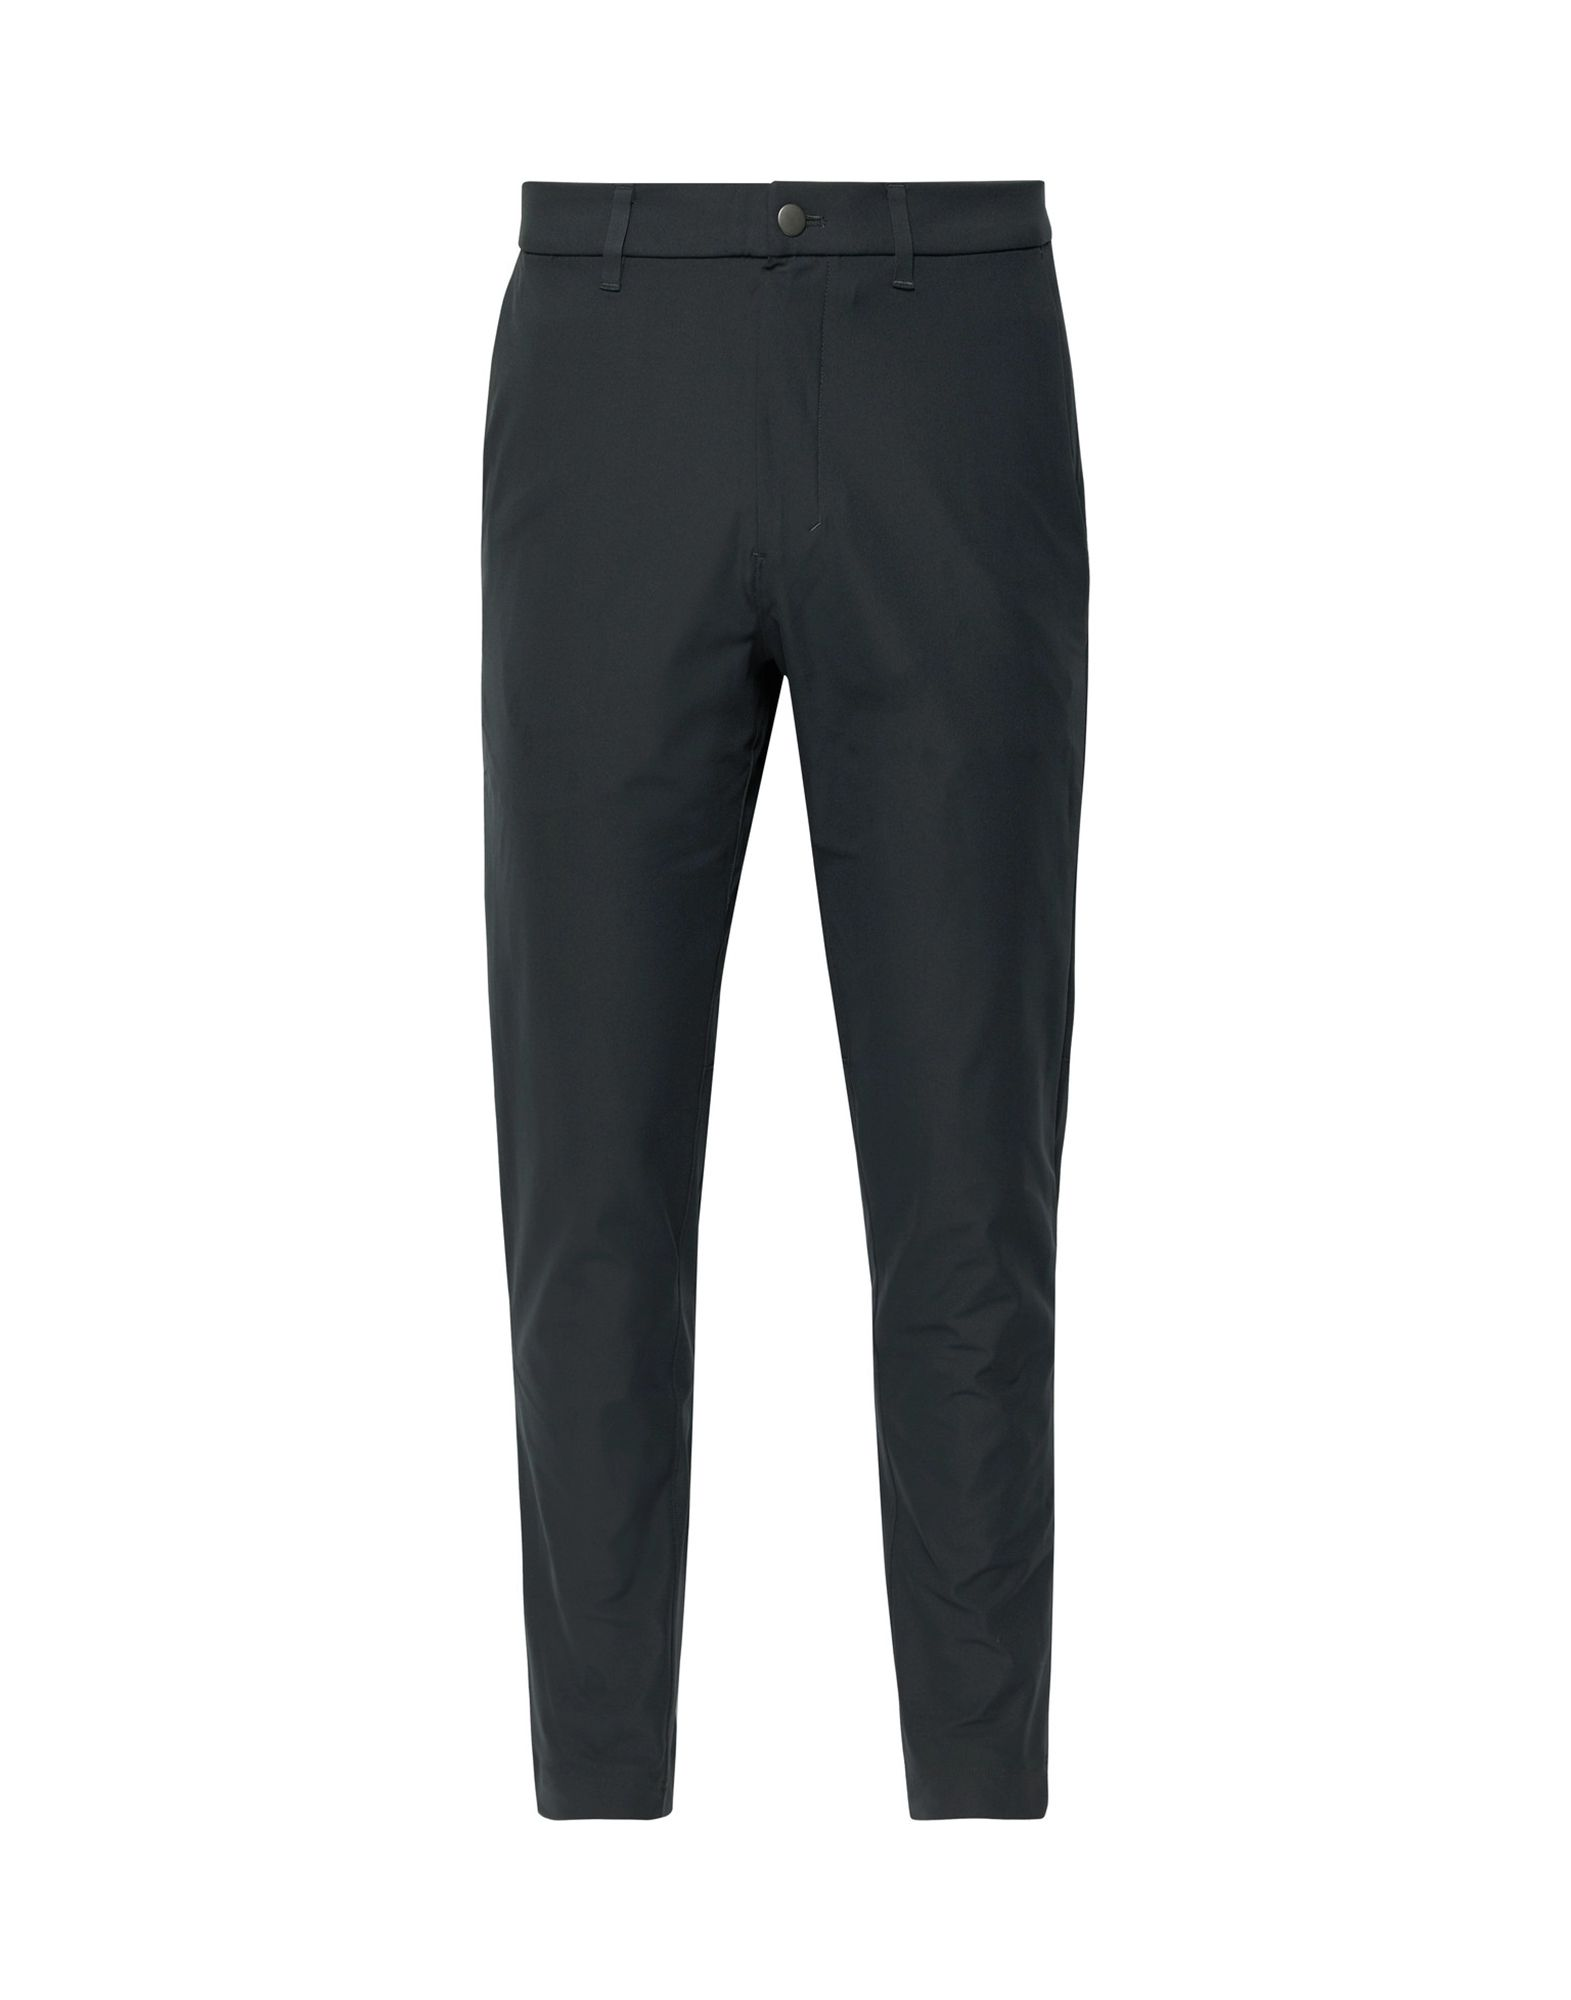 LULULEMON Casual pants. plain weave, solid color, no appliqués, mid rise, regular fit, straight leg, button, zip, multipockets. 100% Polyester